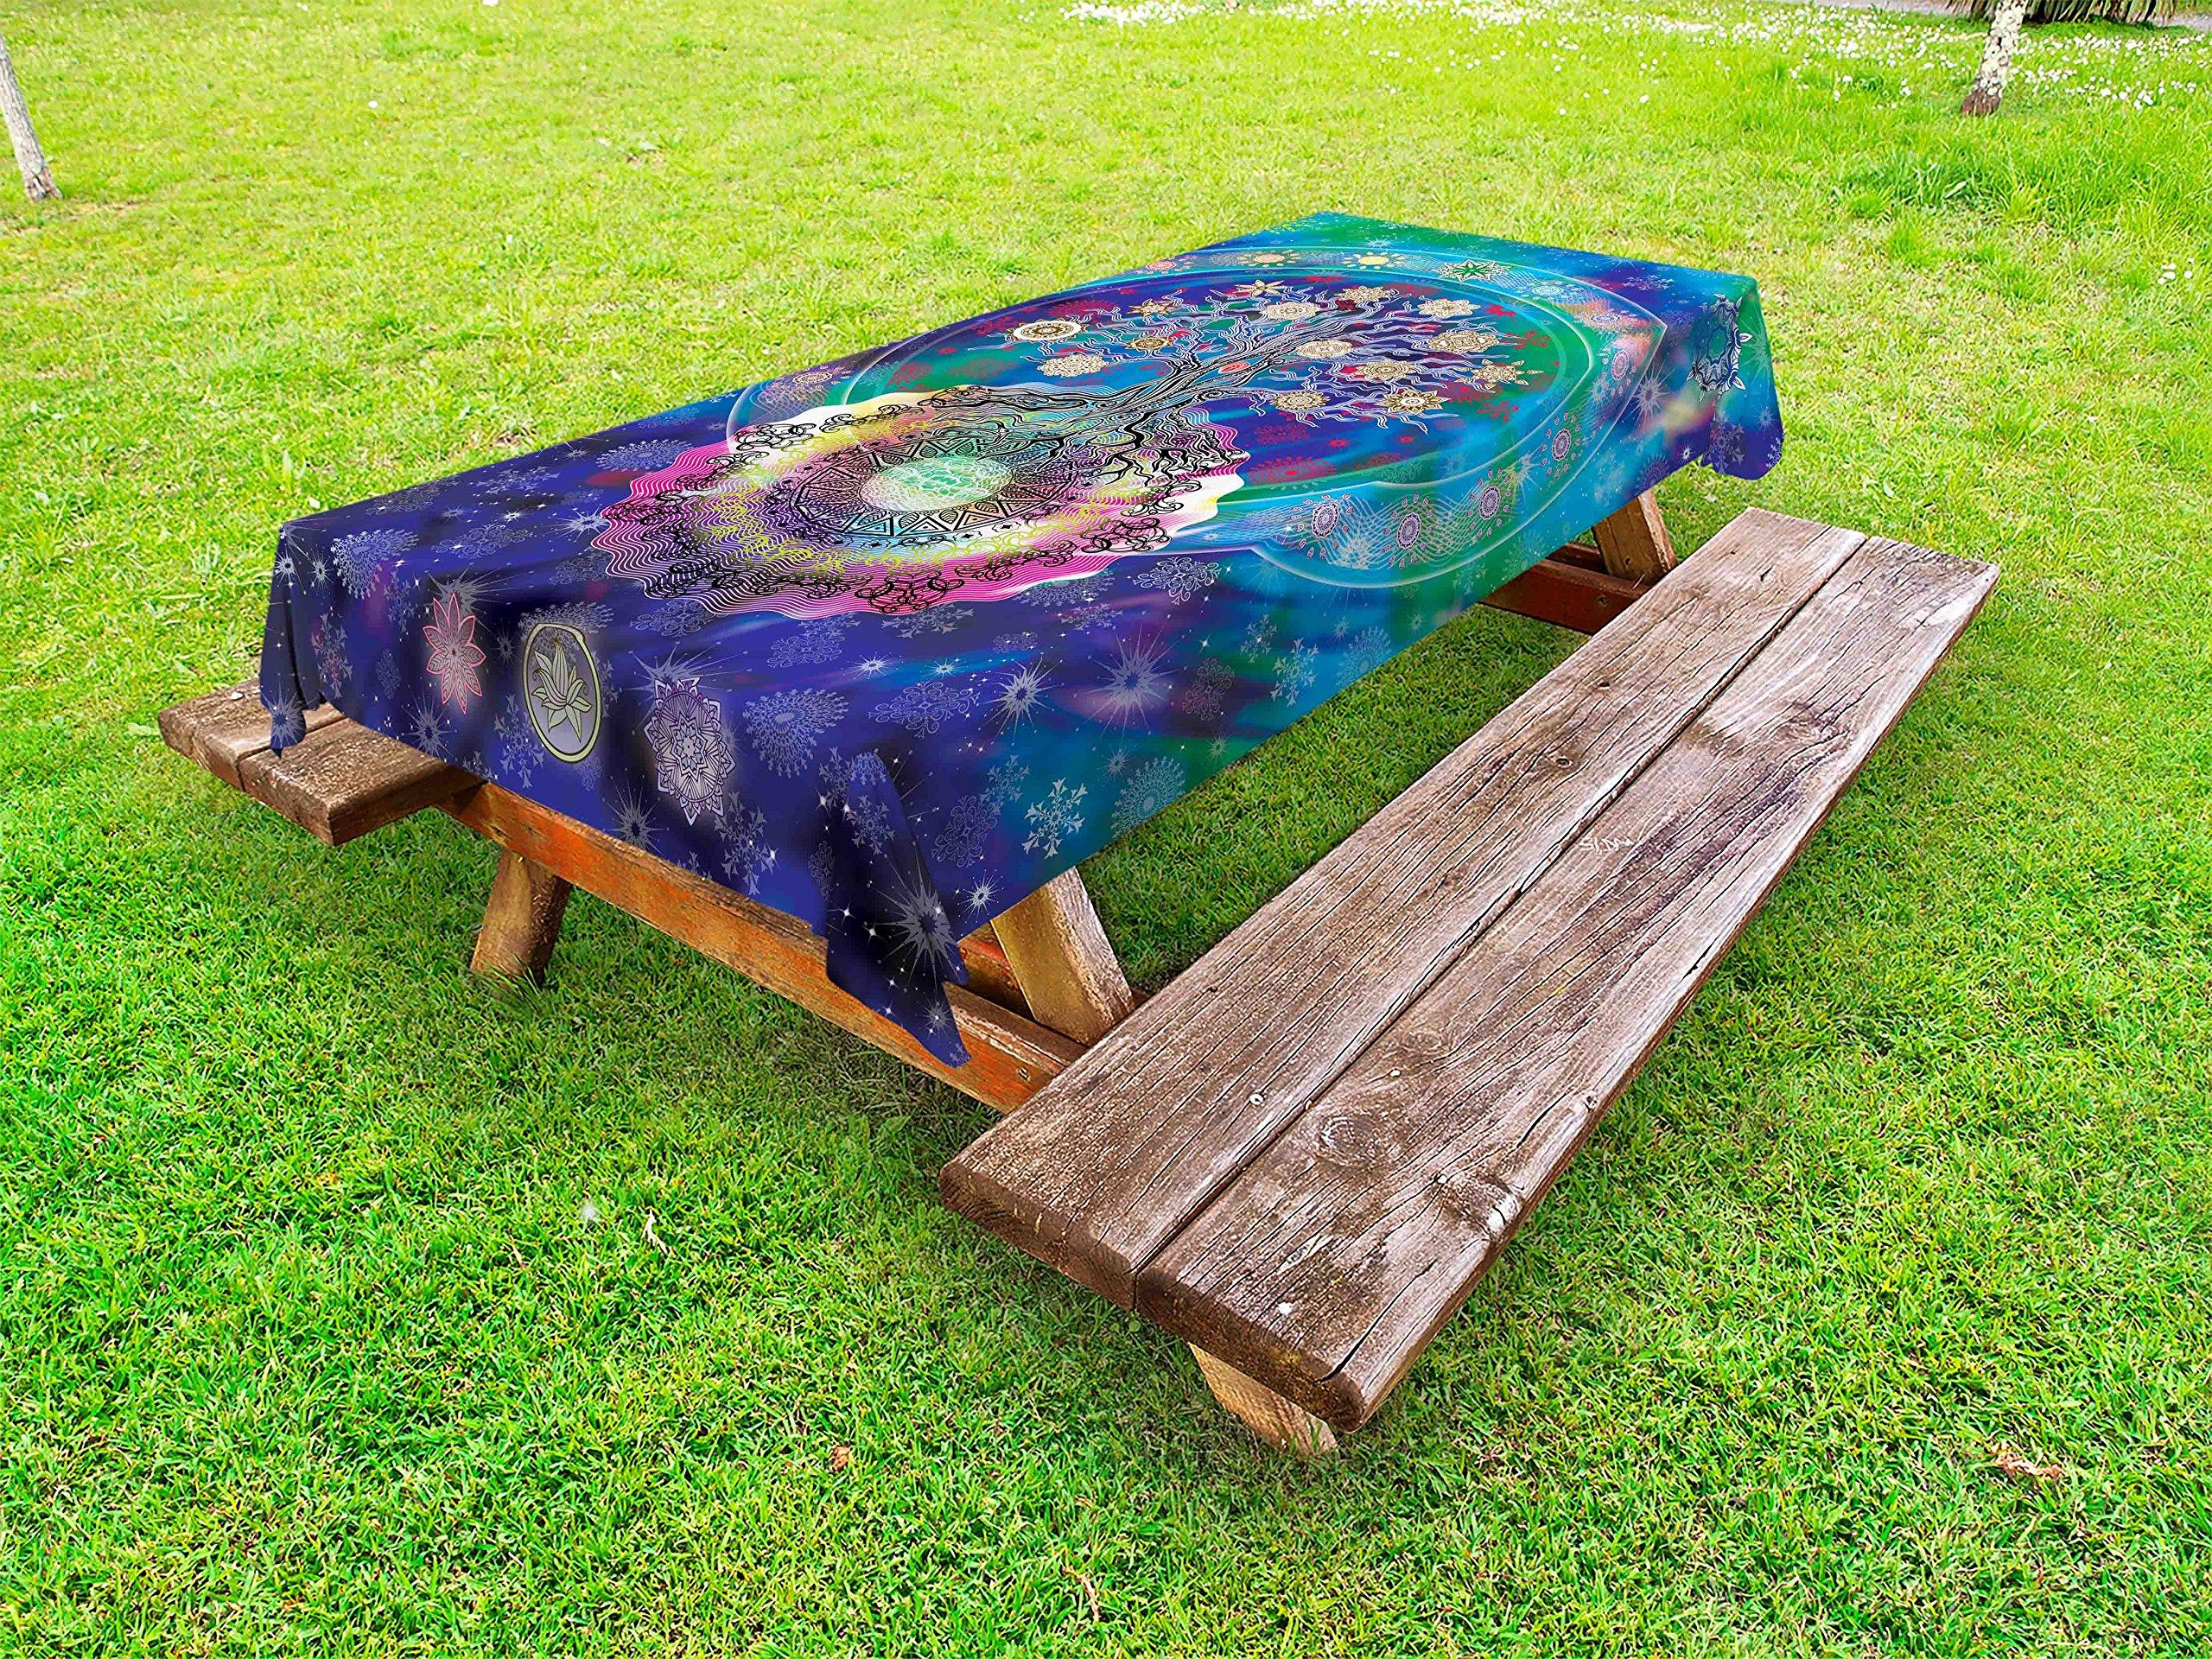 Lunarable Mandala Outdoor Tablecloth, Tree of Life Floral Style Mandala Spiritual Artwork Meditation Peace Spa Design, Decorative Washable Picnic Table Cloth, 58 X 84 inches, Blue Purple